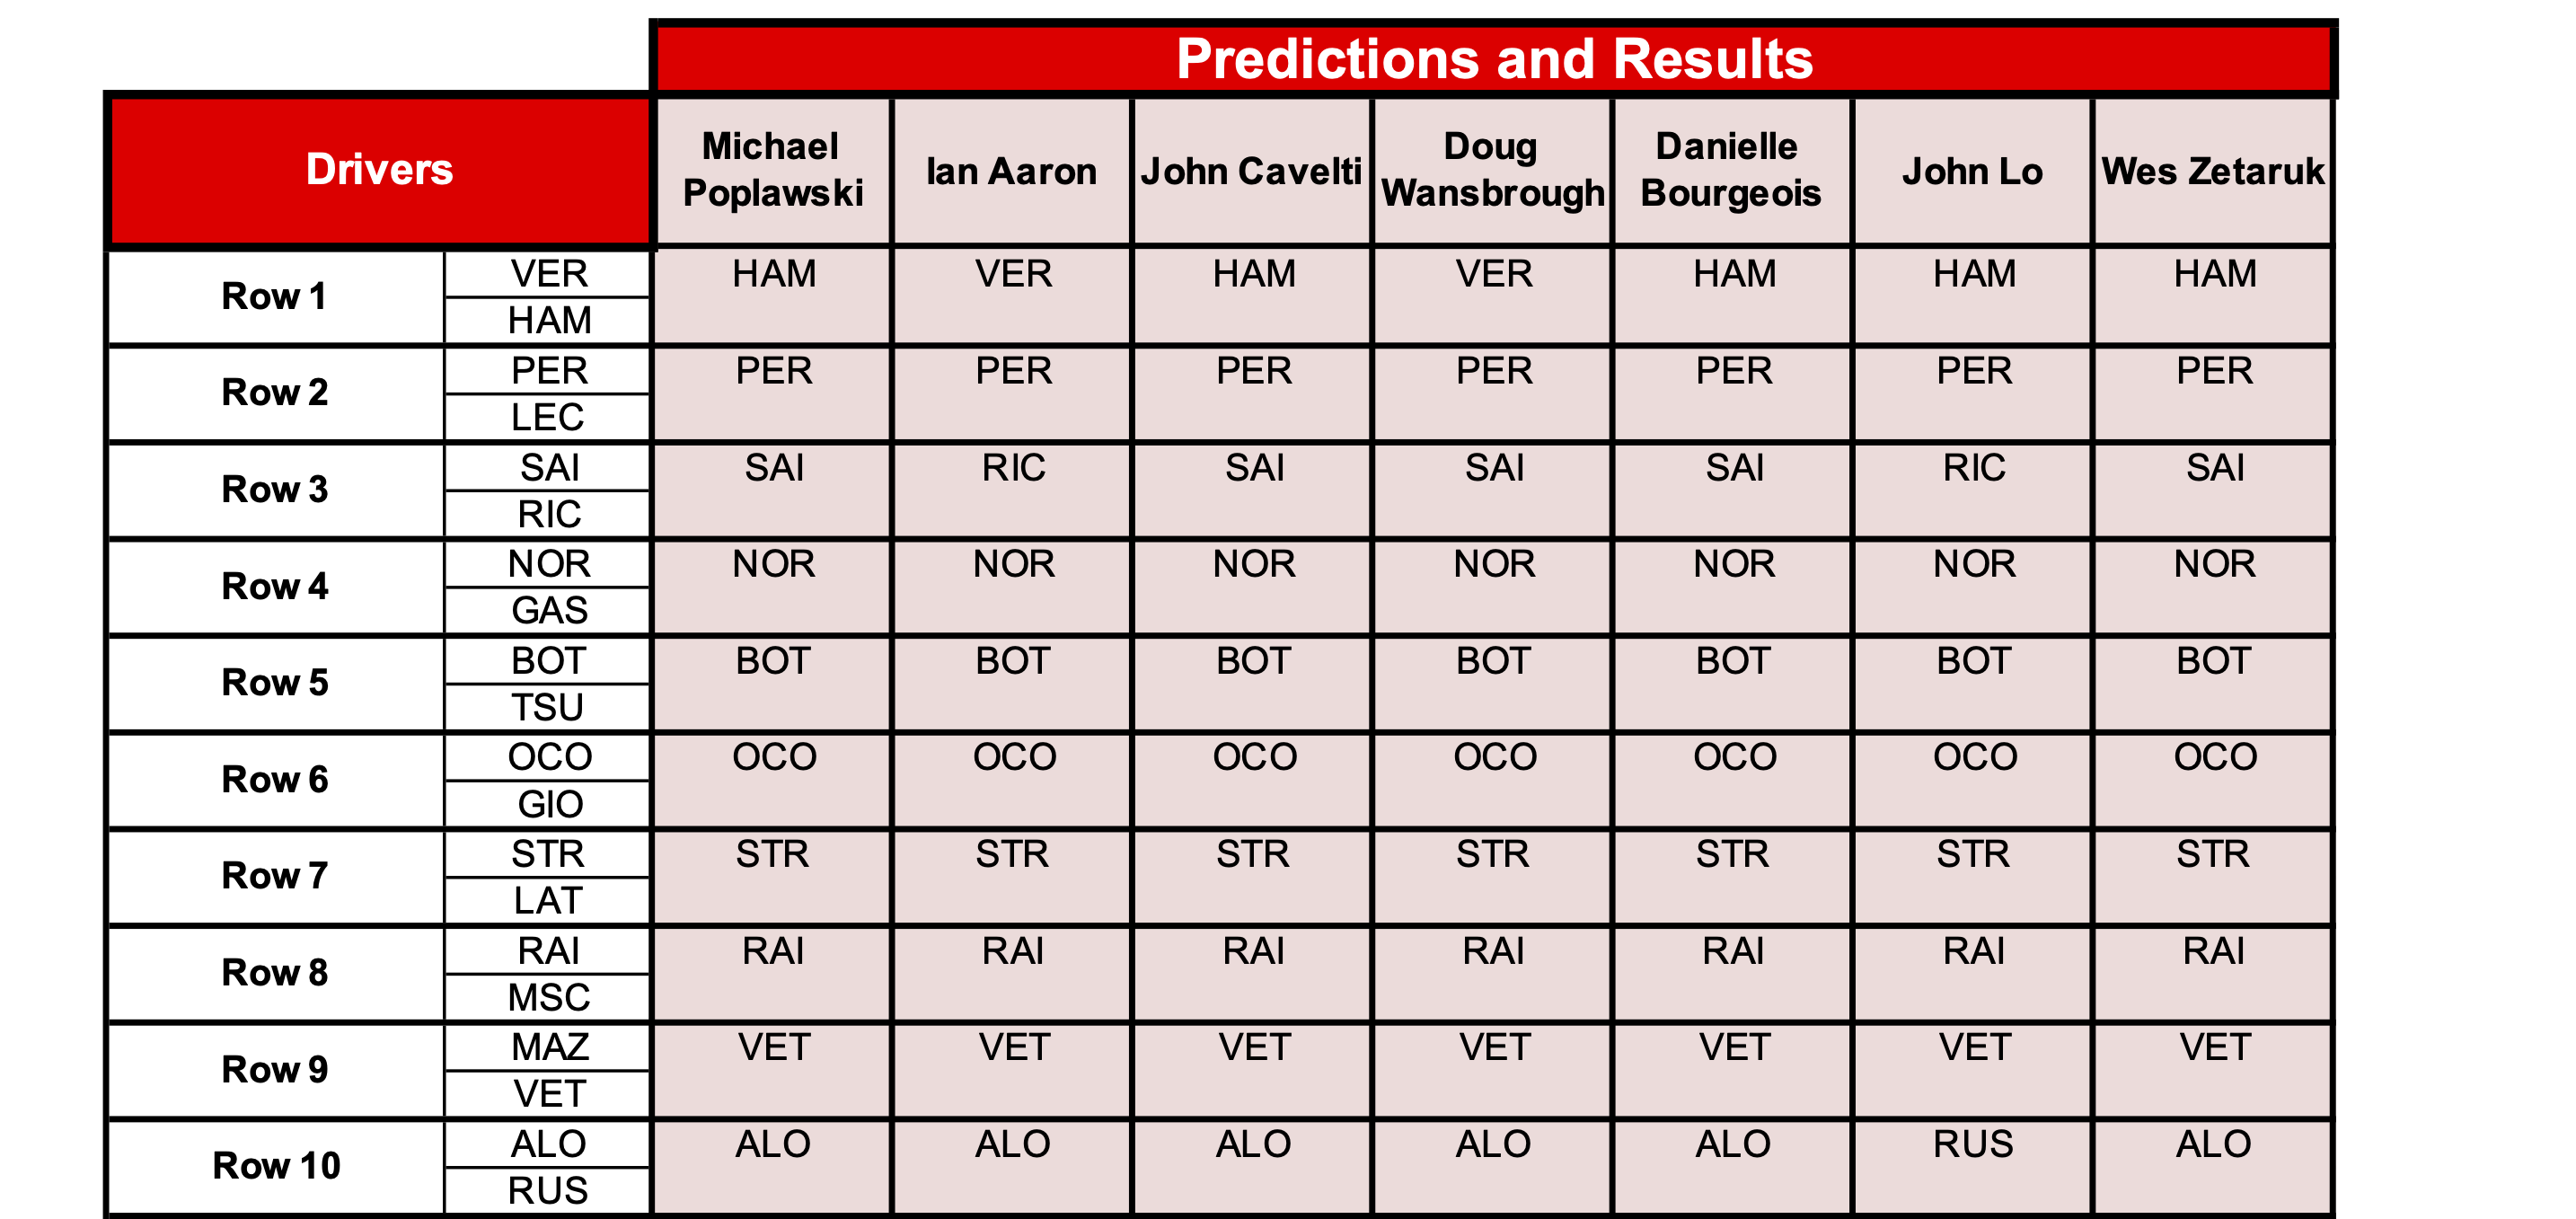 17 predictions